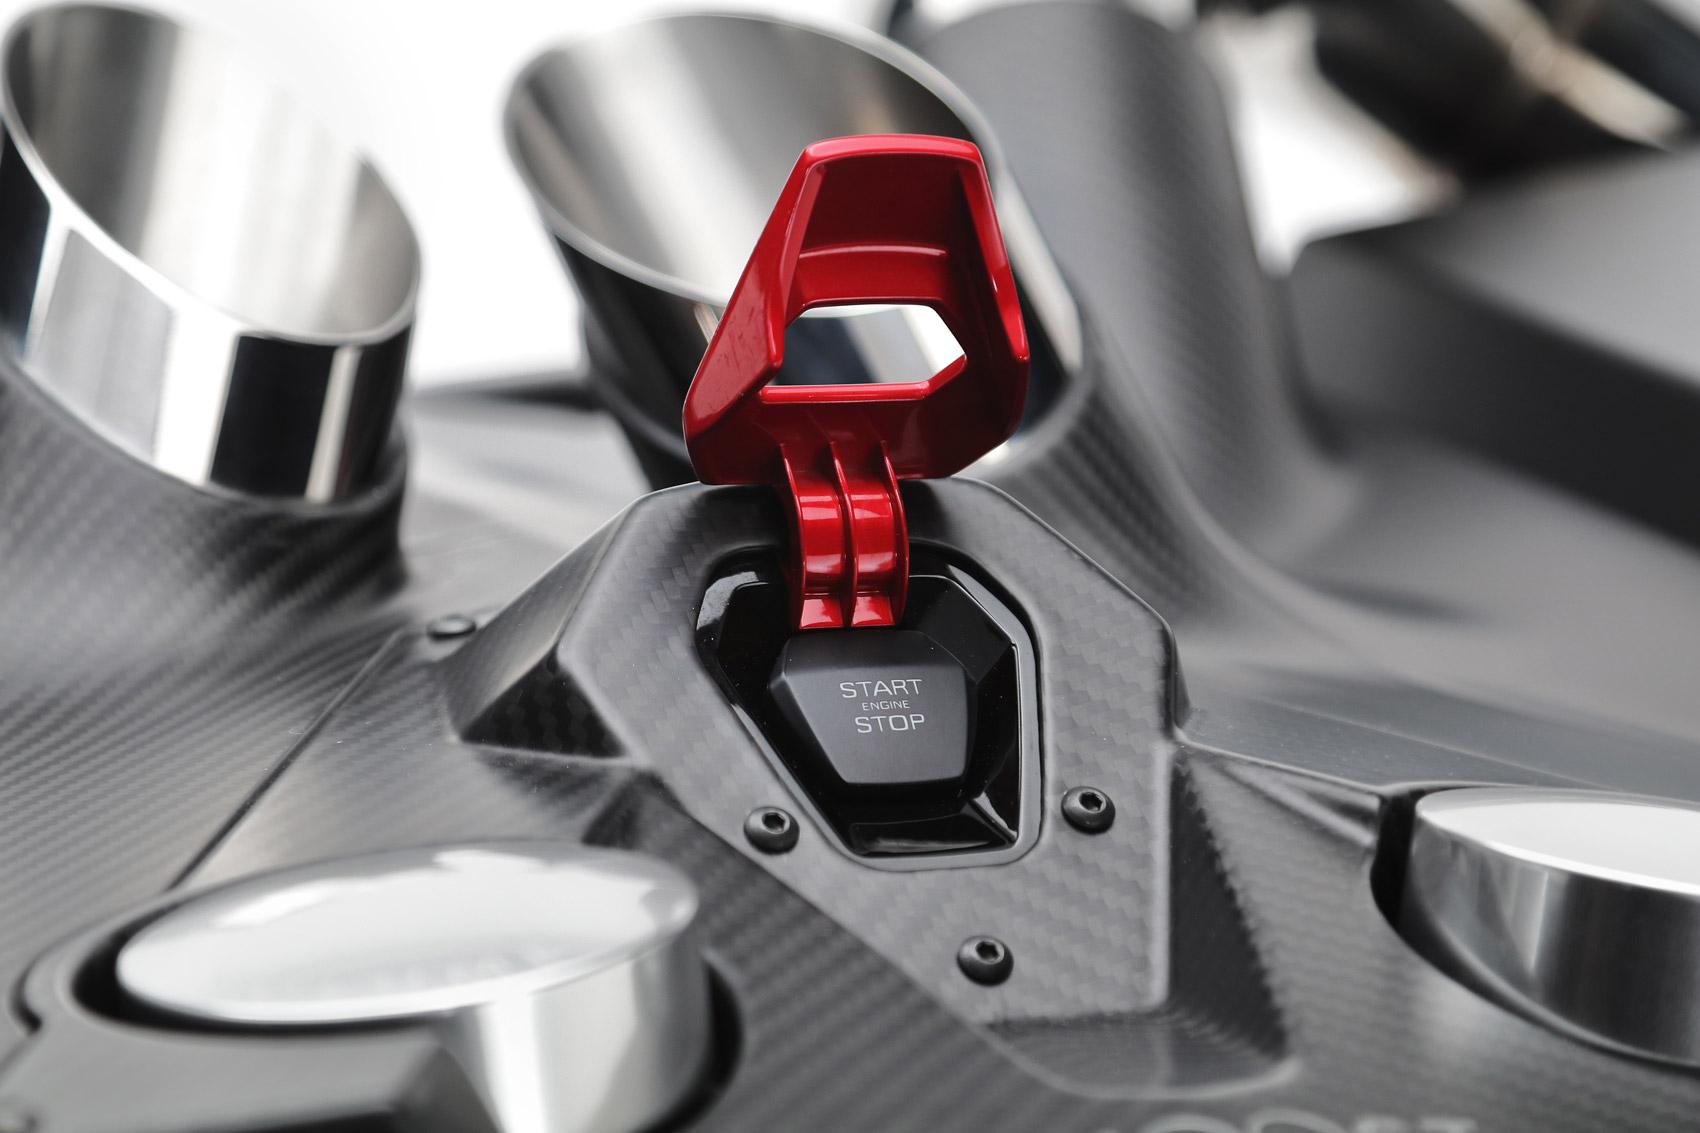 €20,000 Lamborghini Speakers Go On Display at H.R. Owen Showroom